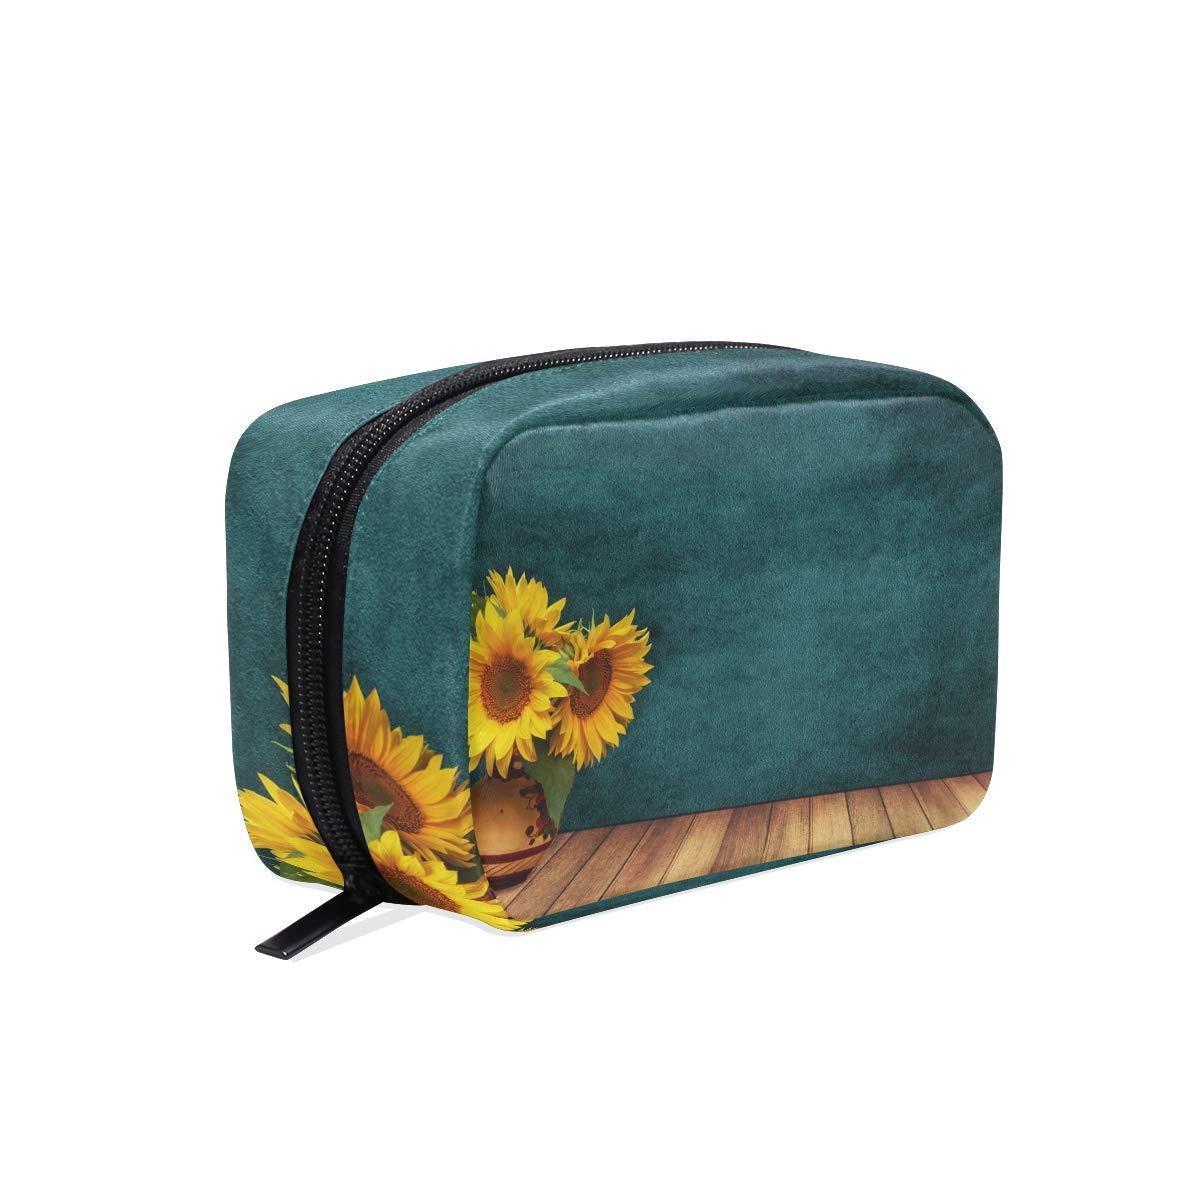 Amazon.com : Sunflowers Wood Vase Makeup Bag Organizer ... on zipper hat, zipper mask, zipper bracelet, zipper wall, zipper painting, zipper car, zipper doll,